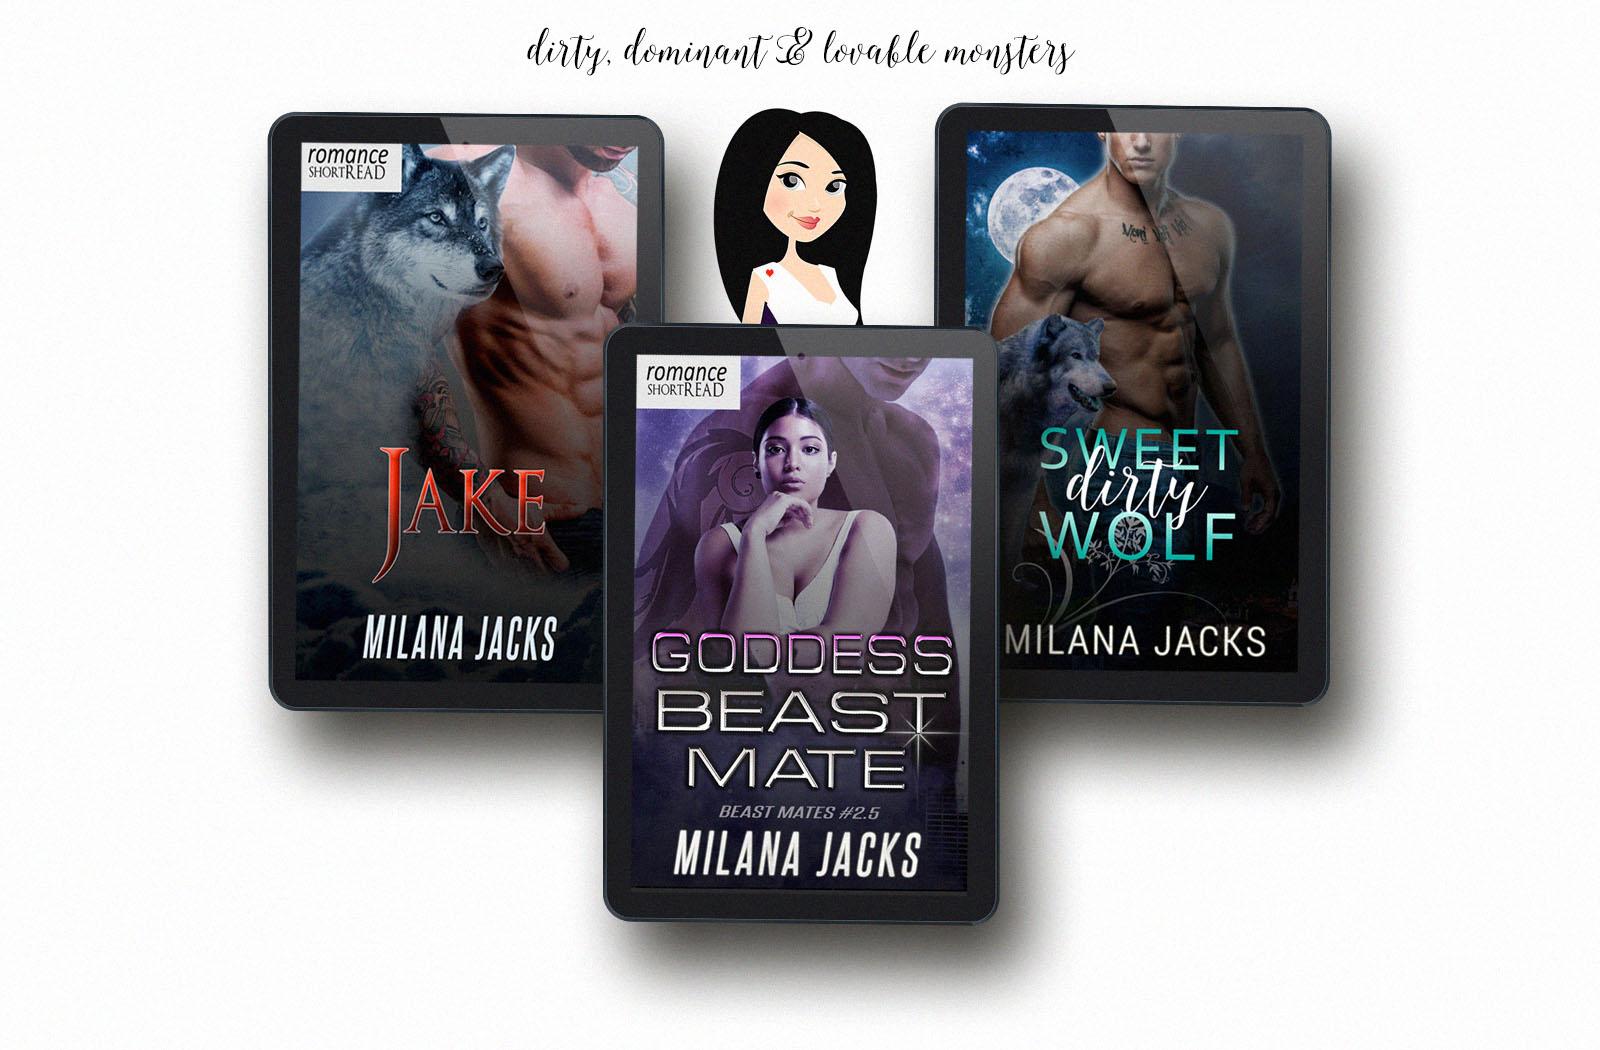 milana jacks, dark dirty romance, monster romance, paranormal romance, free ebooks